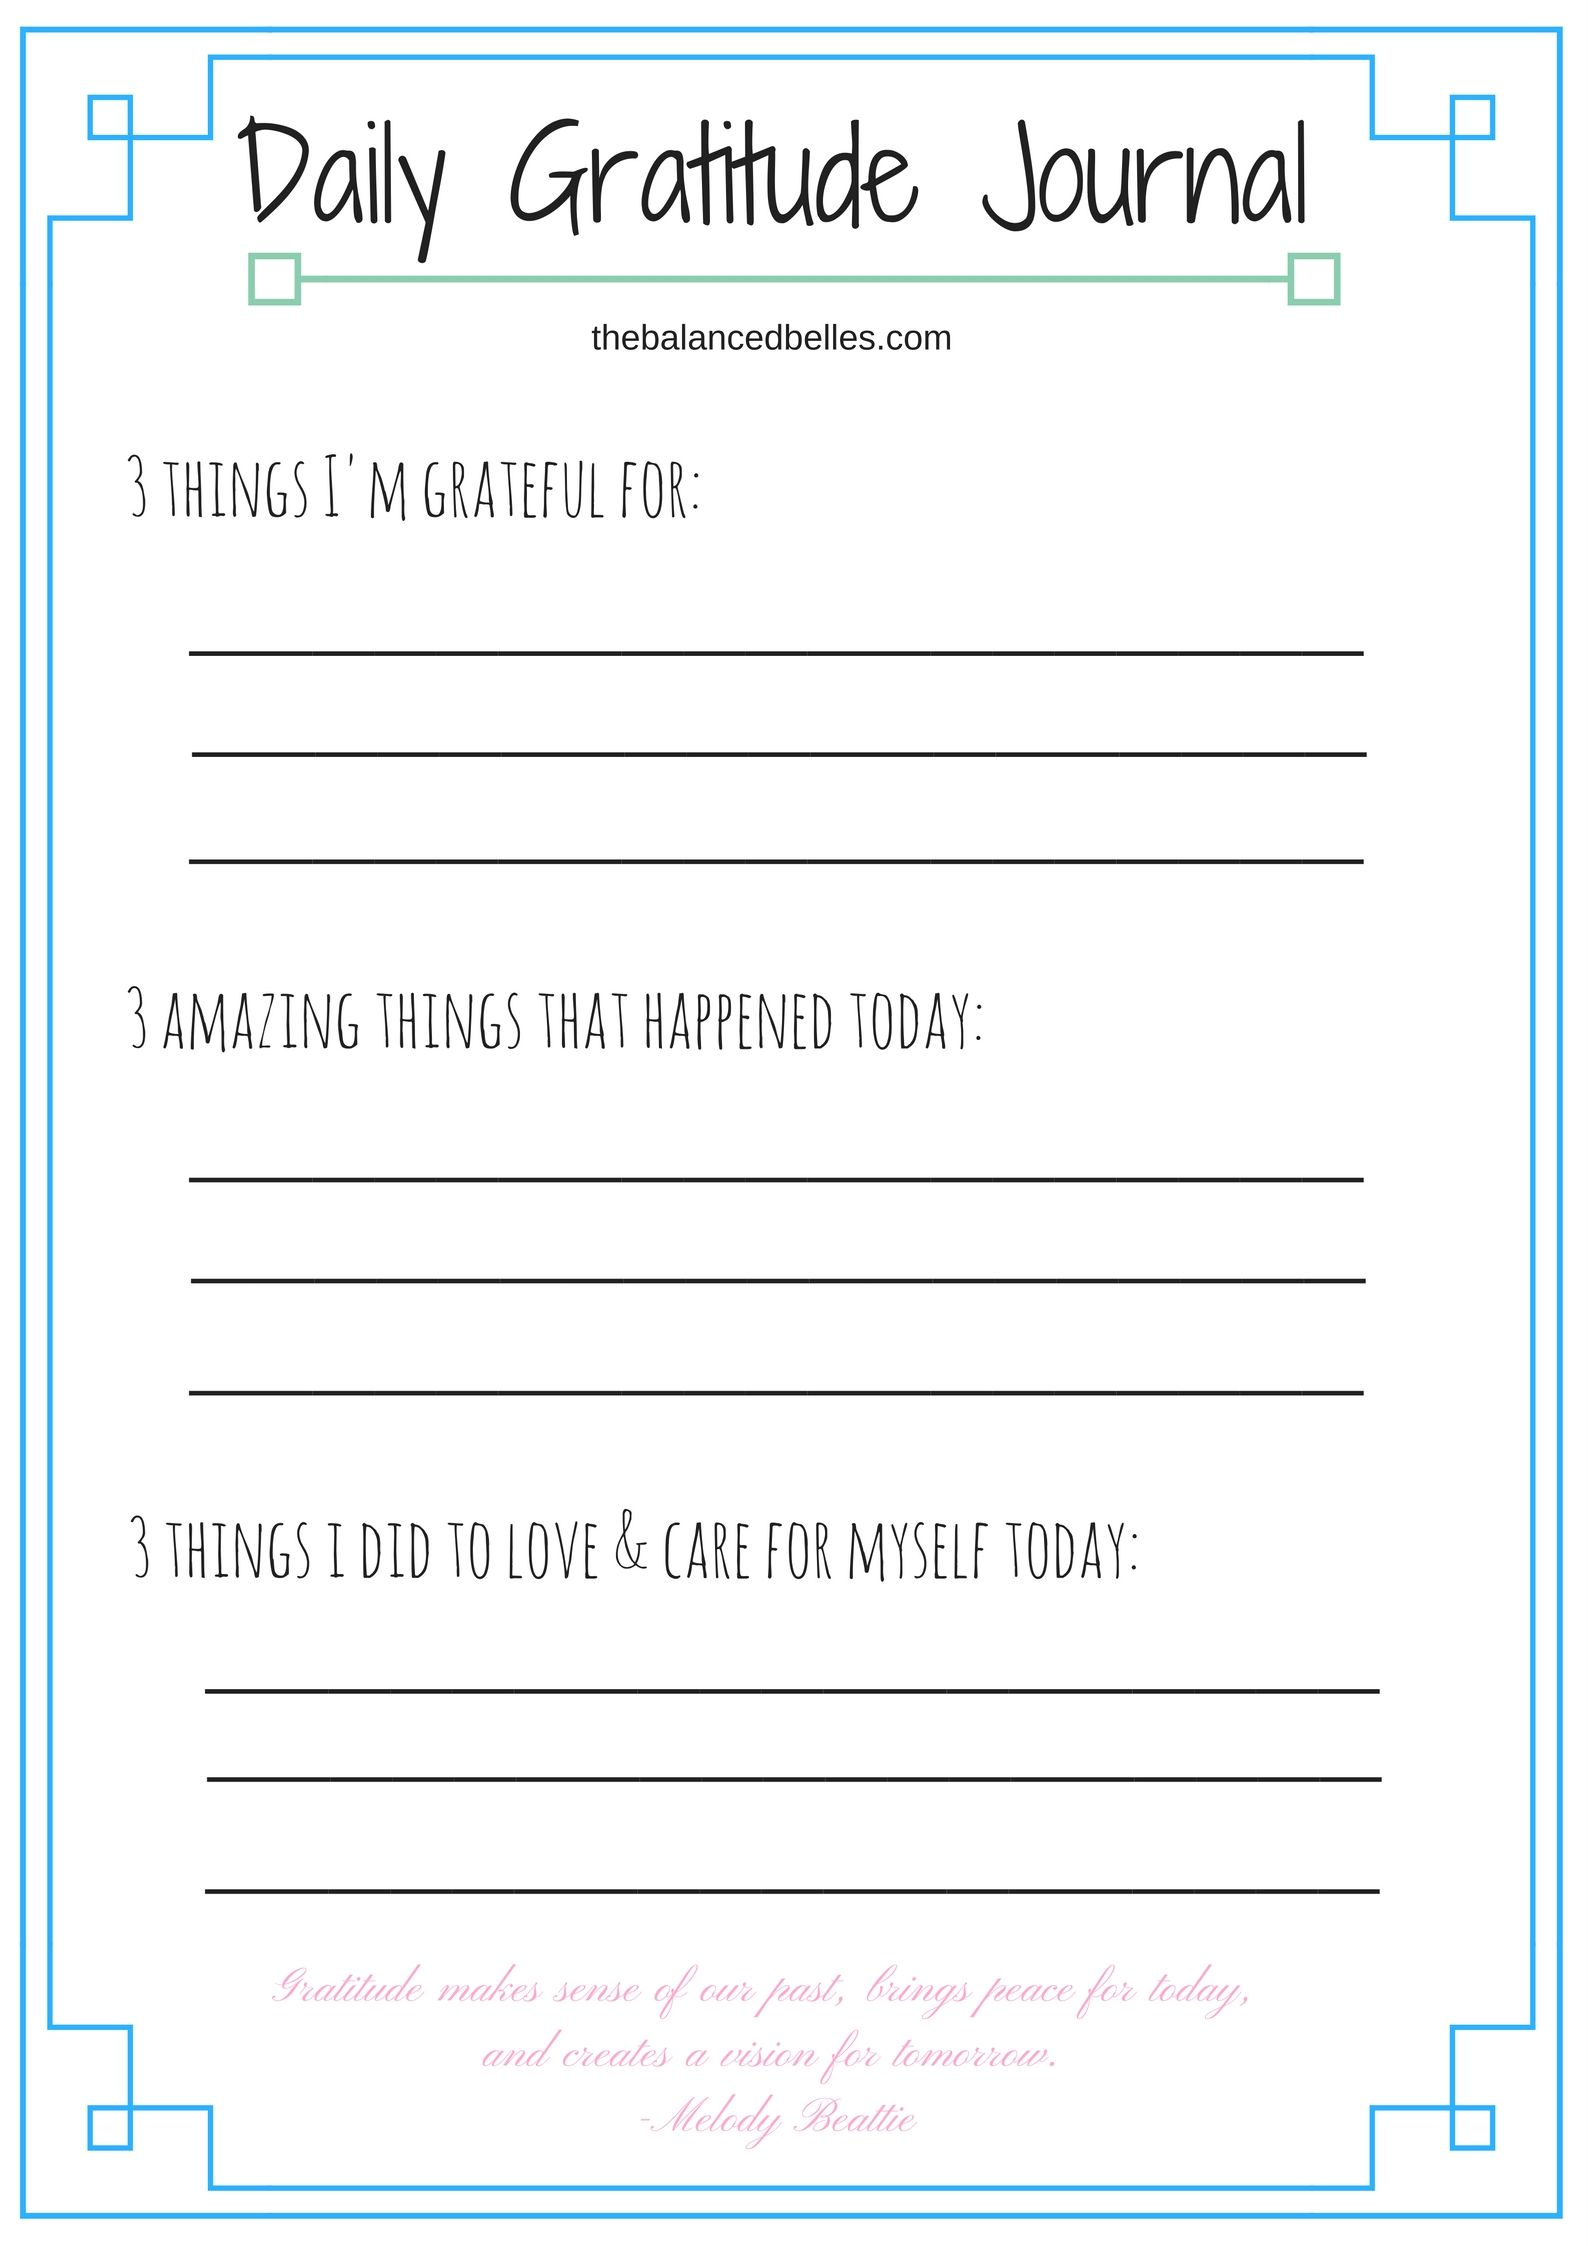 Daily Gratitude Journal For Mental Health